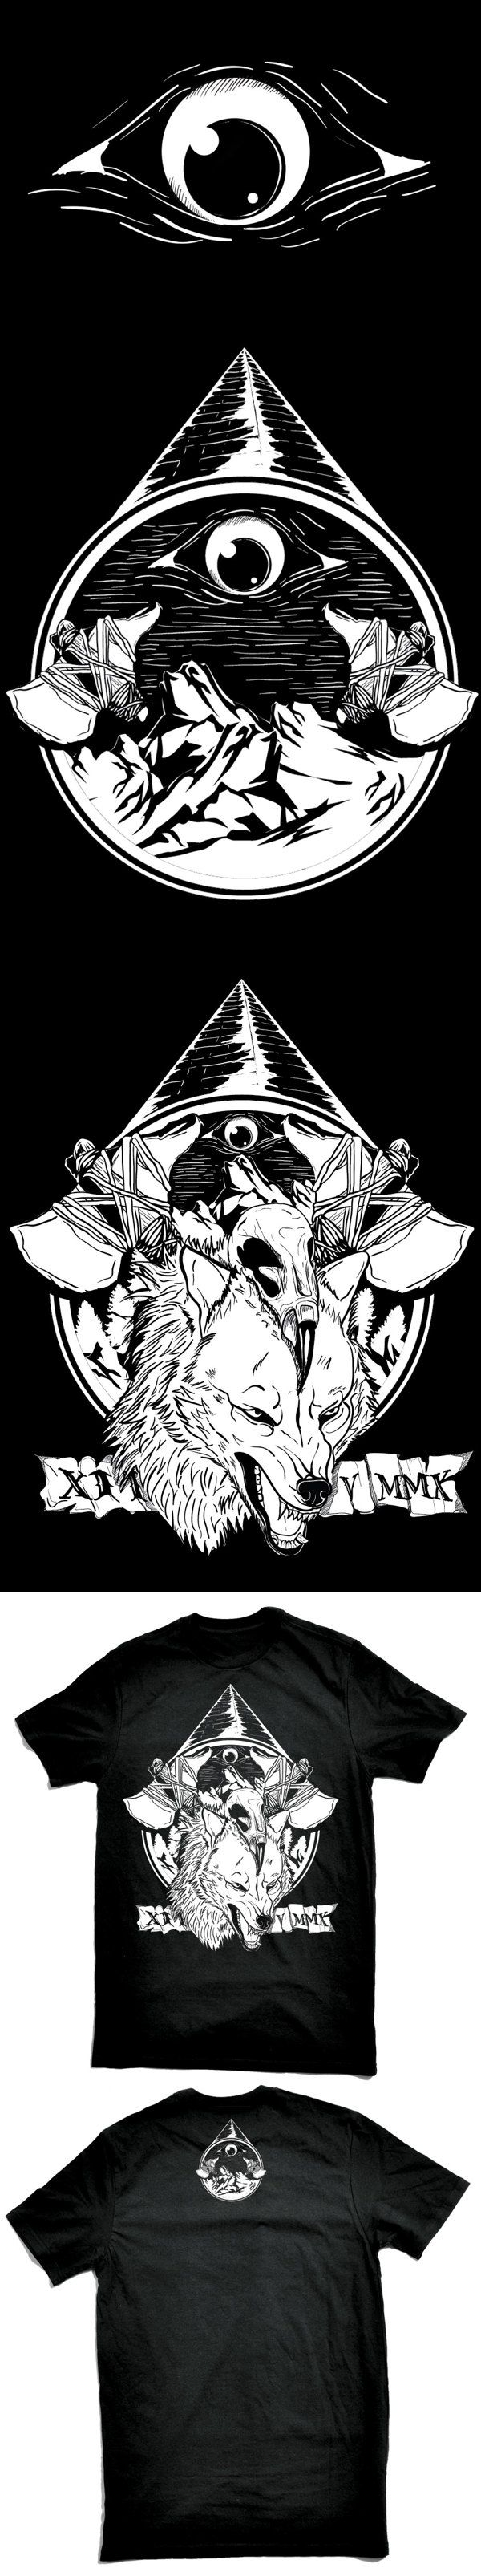 Story of Wolf by luigi oriza, via Behance